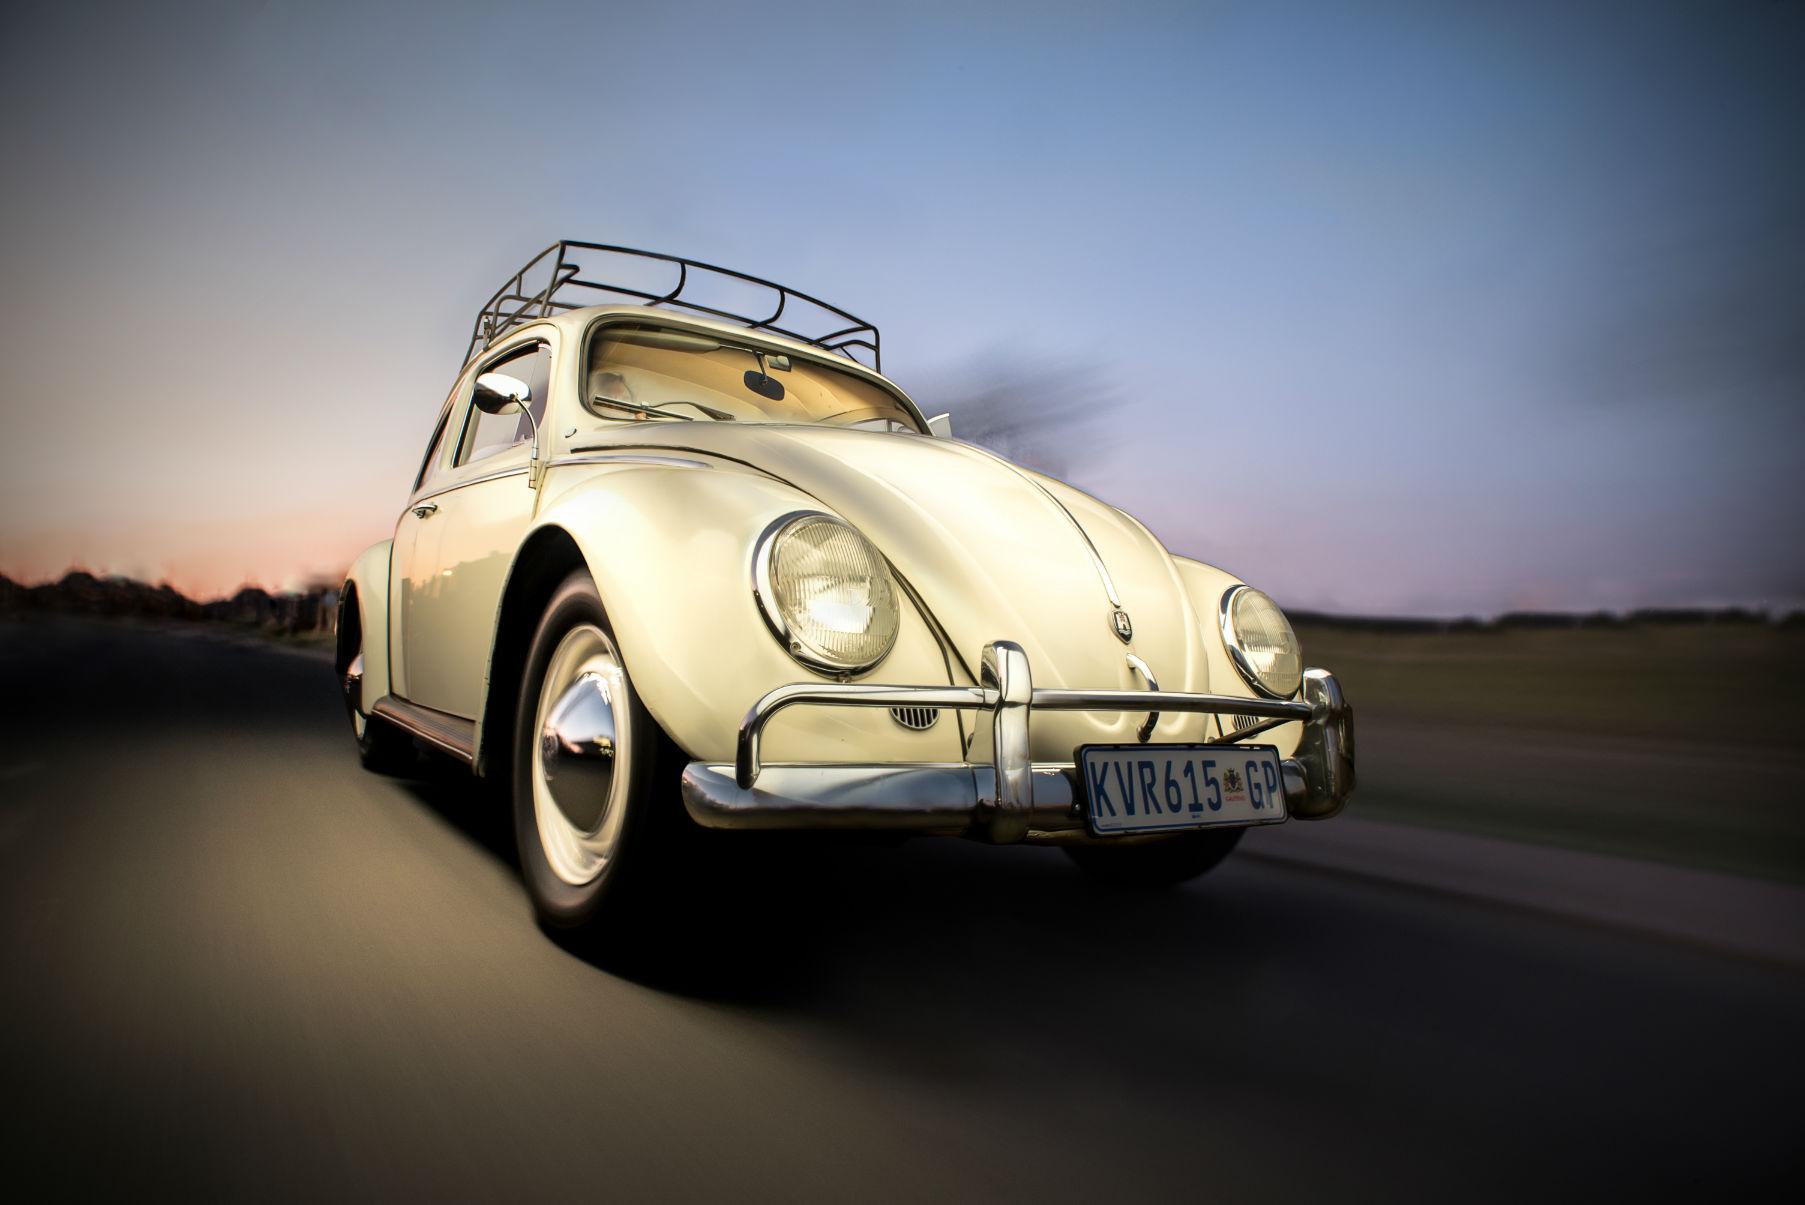 VW beetle_classic_automotive_4a_sarel_photowise-003-small